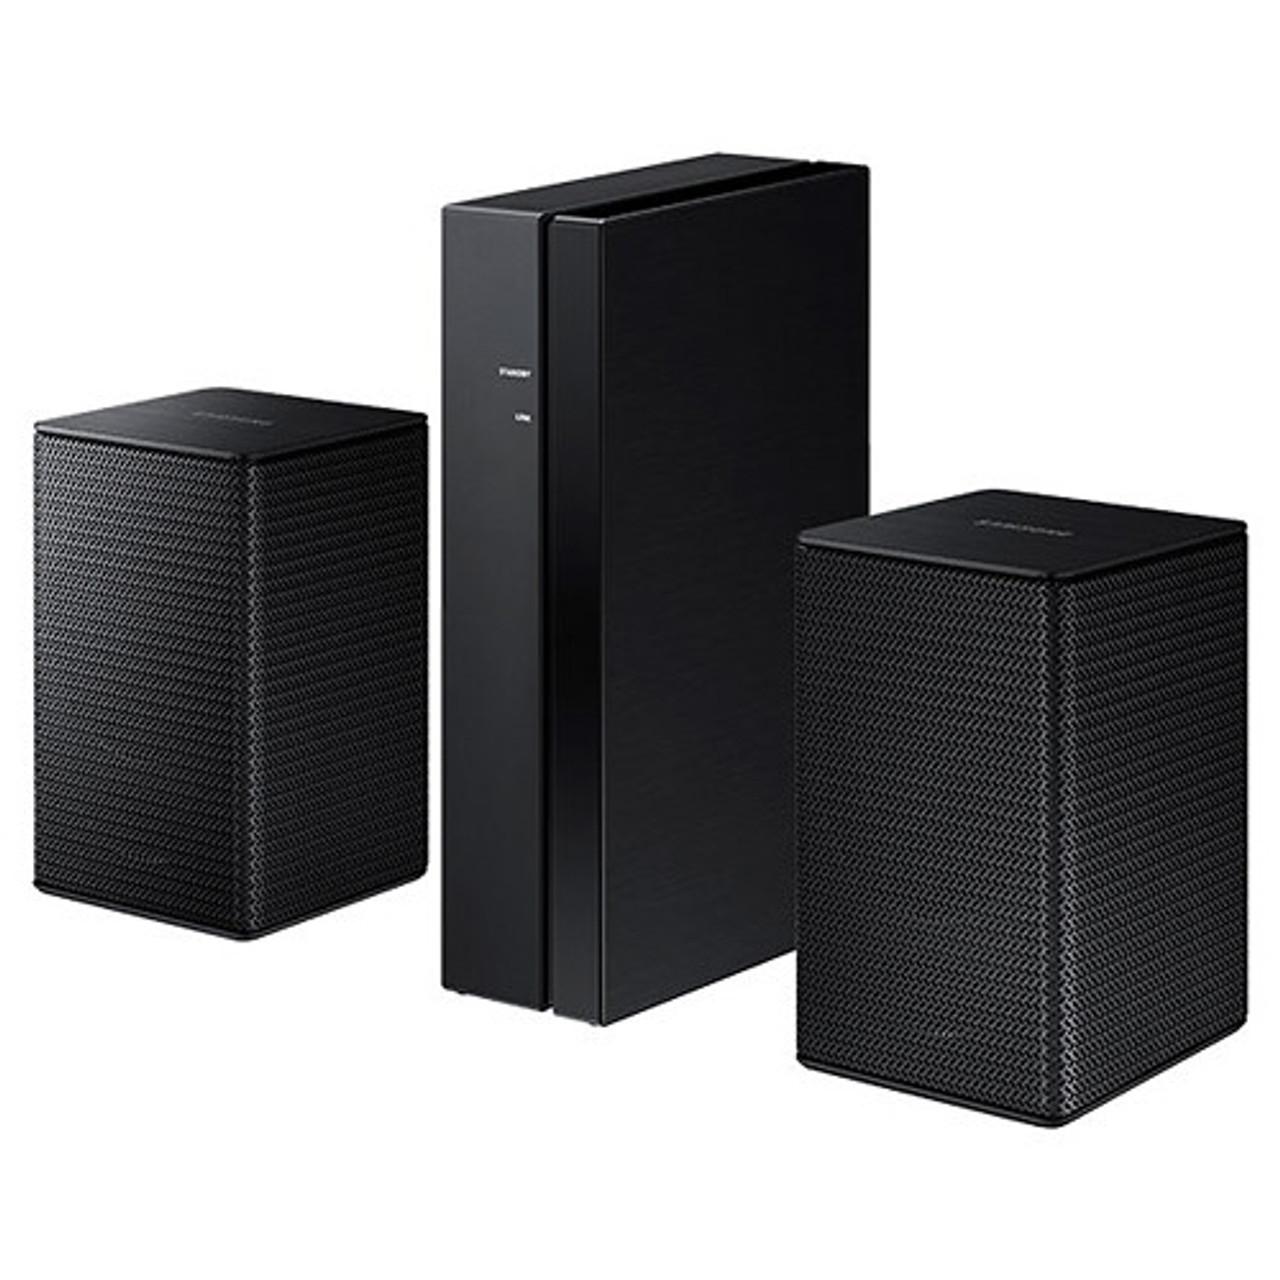 Samsung HW-K370/ZAR 200W 4.1-Channel Soundbar System - Certified Refurbished